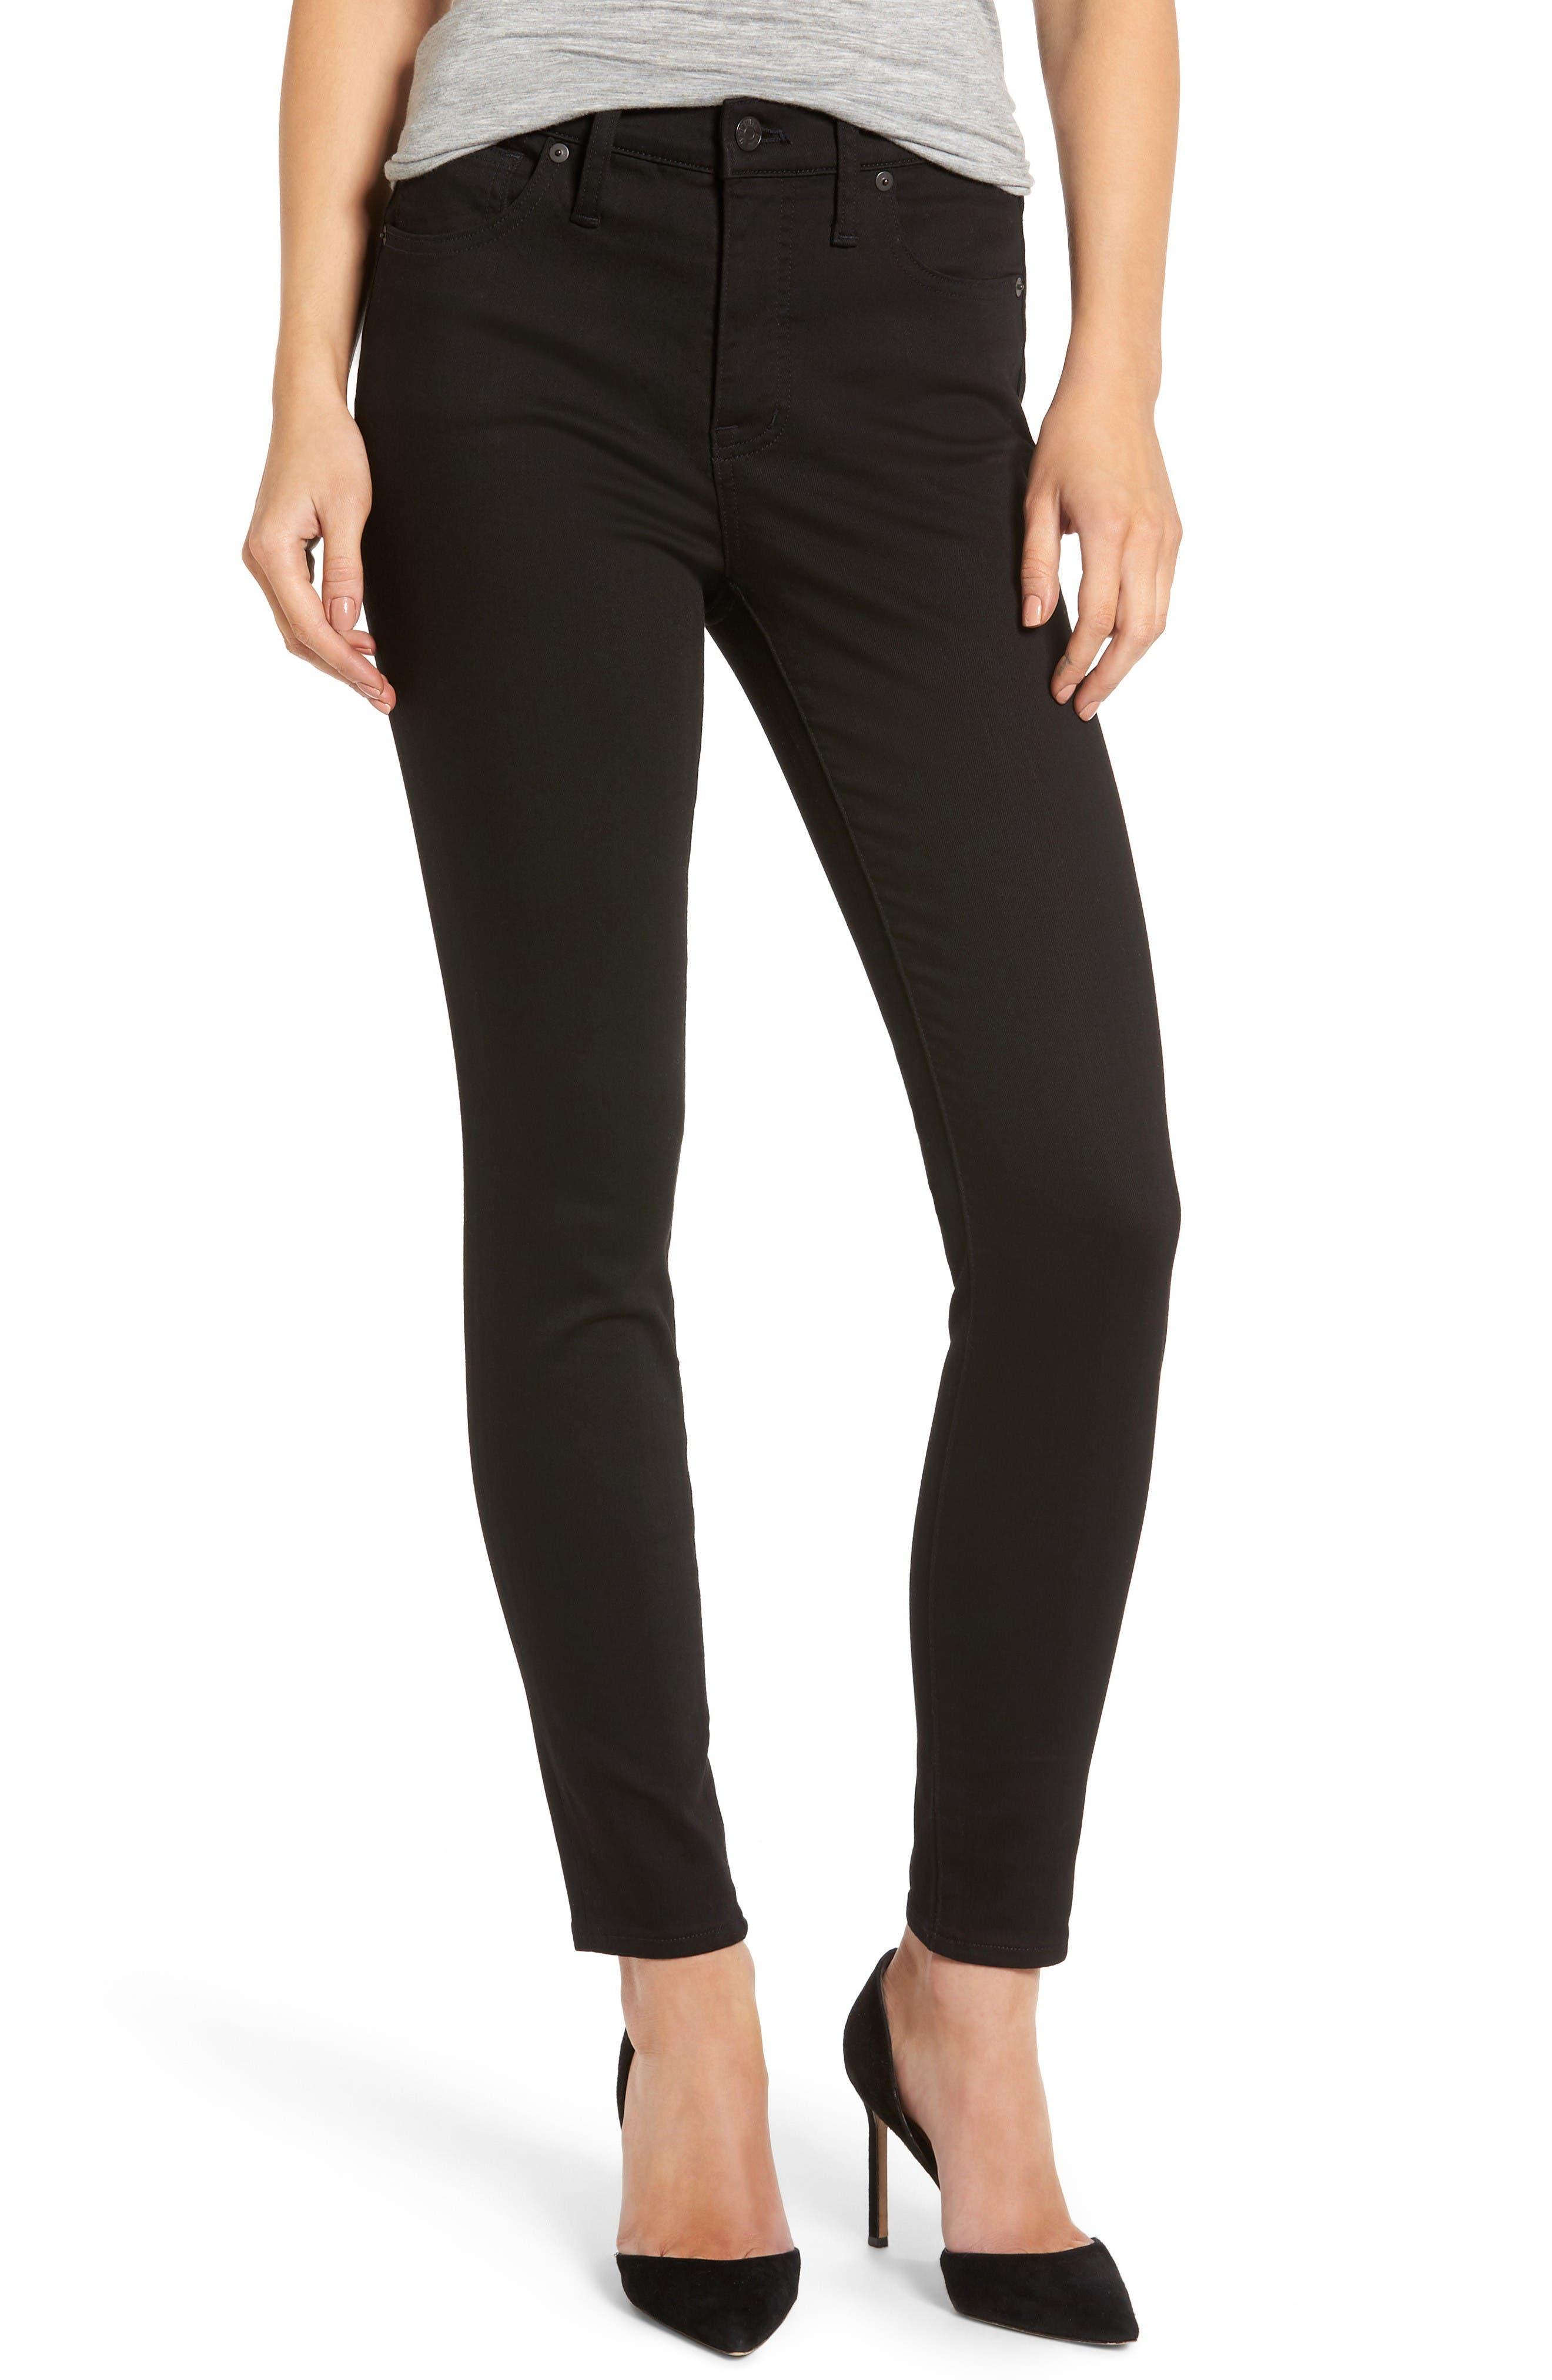 Alternate Image 1 Selected - Madewell High Waist Skinny Jeans